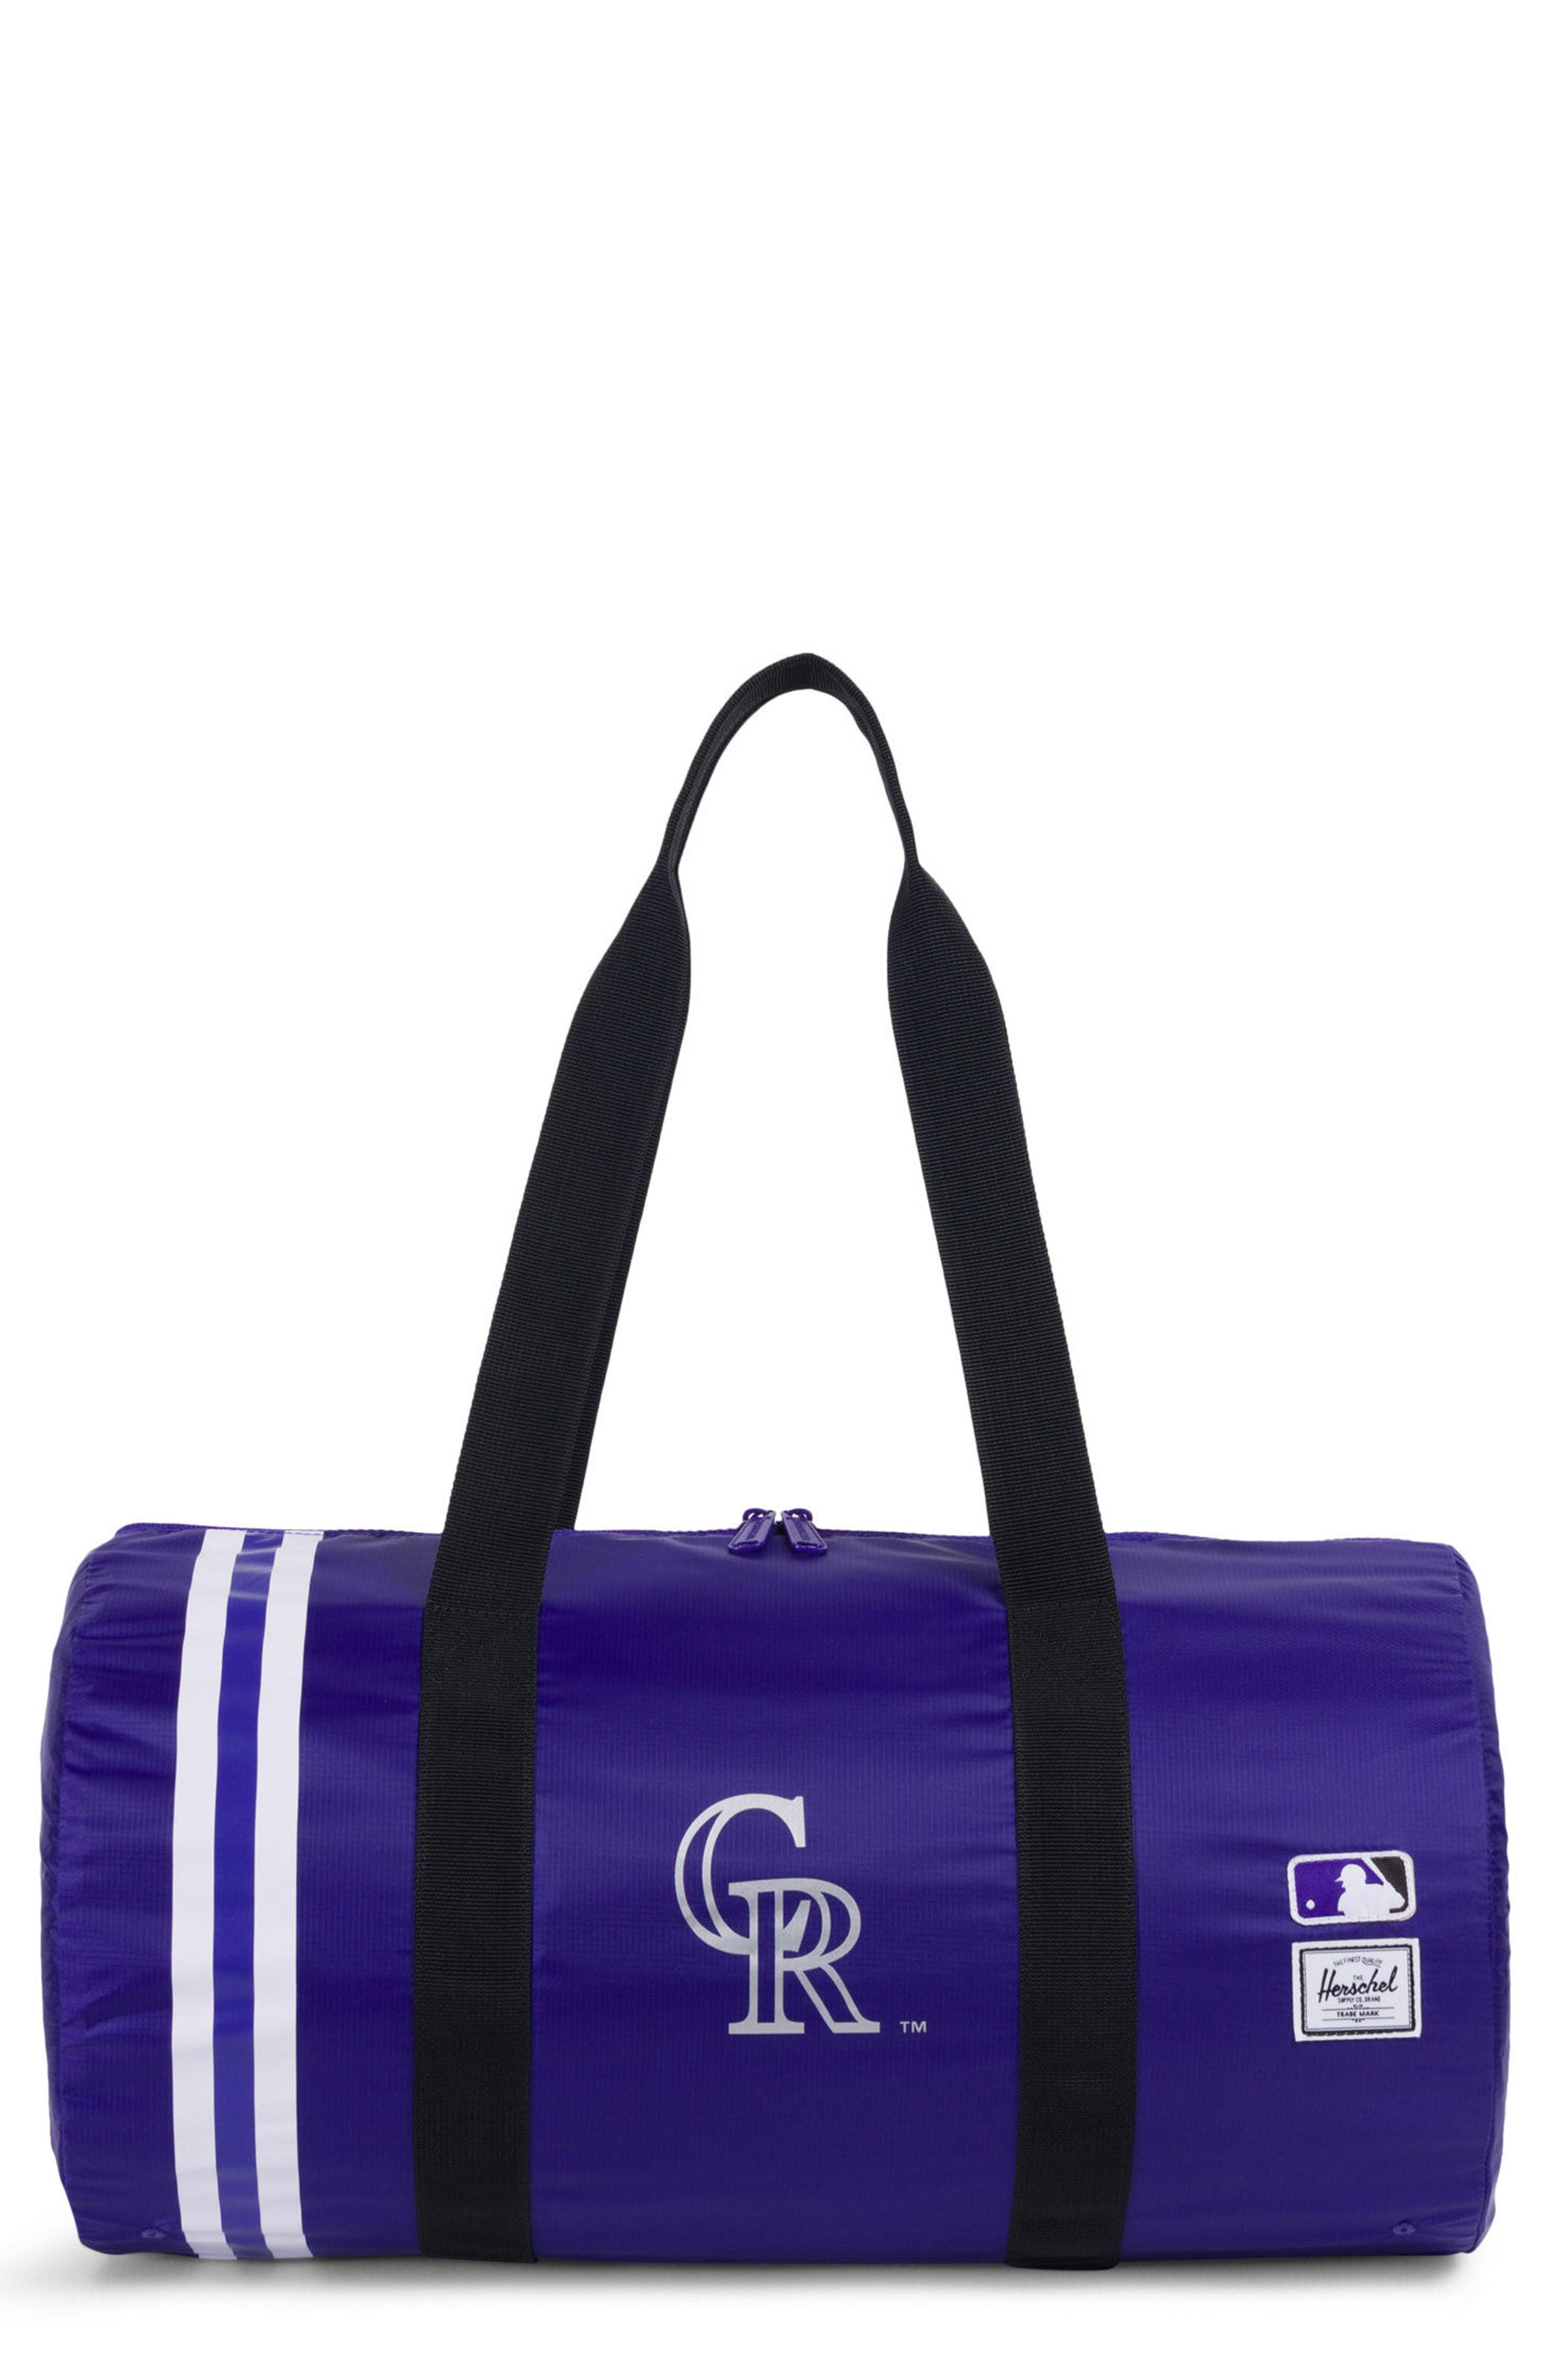 6efa92c1f5 Herschel Supply Co. Men s Purple Packable - Mlb National League Duffel Bag